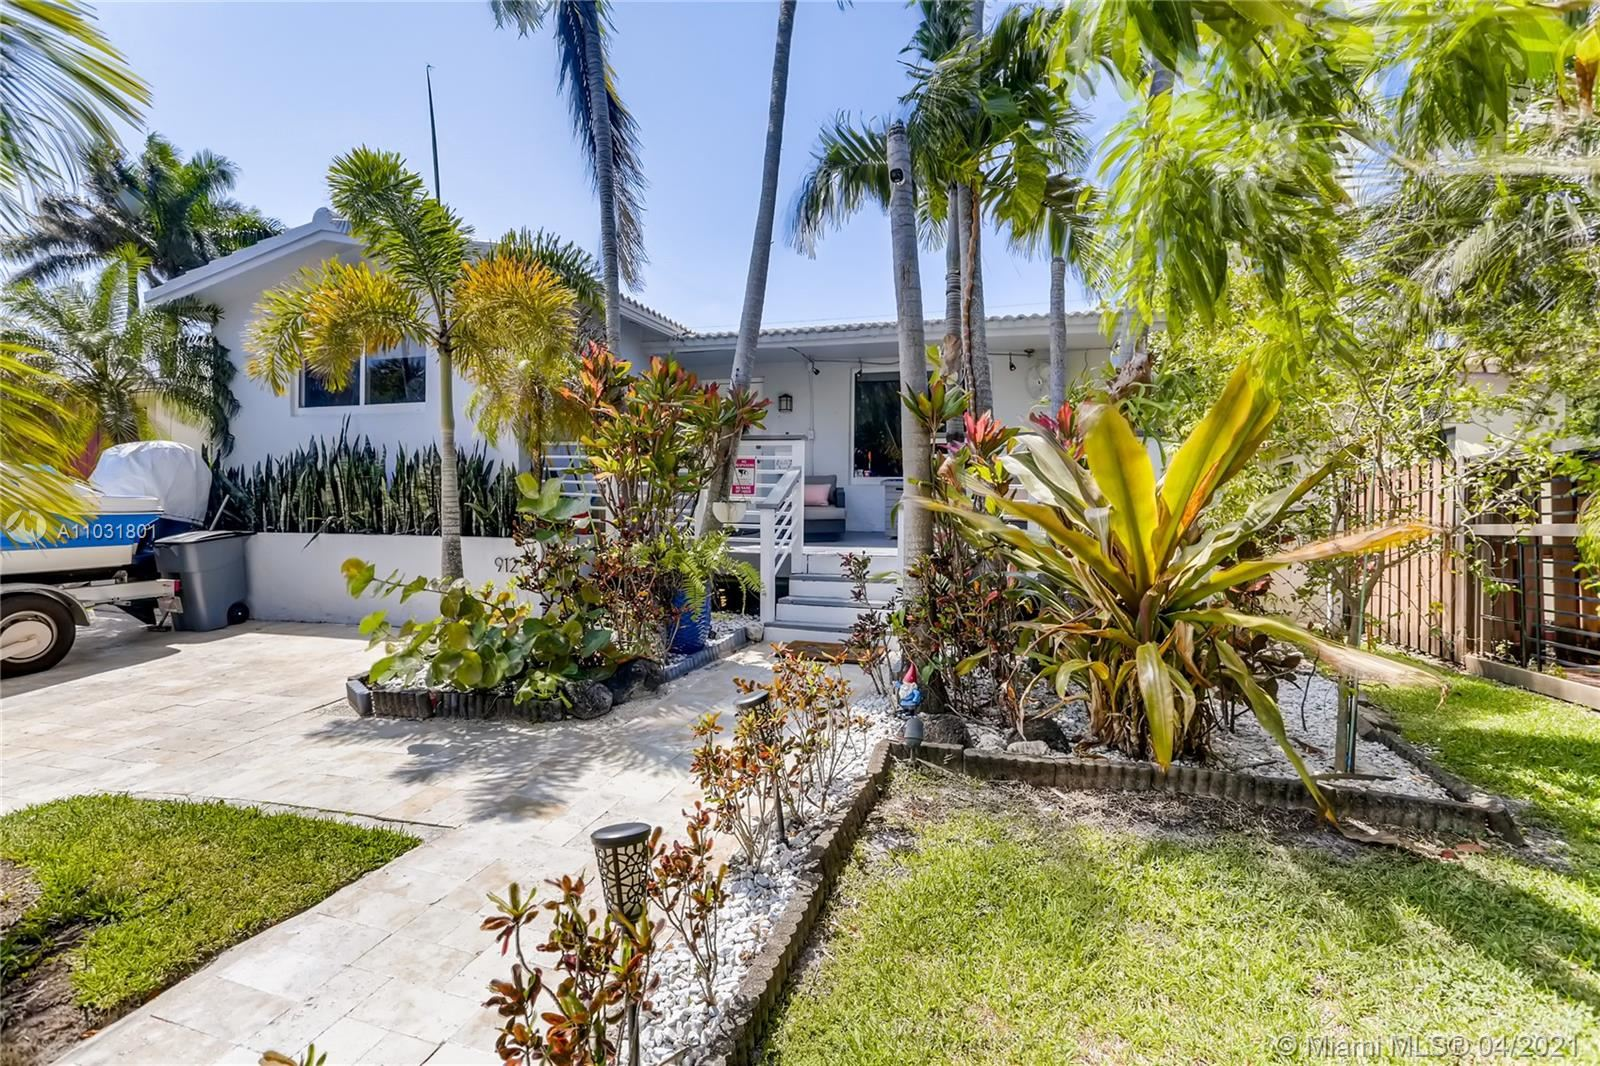 912 Johnson St, Hollywood, FL 33019 - #: A11031801